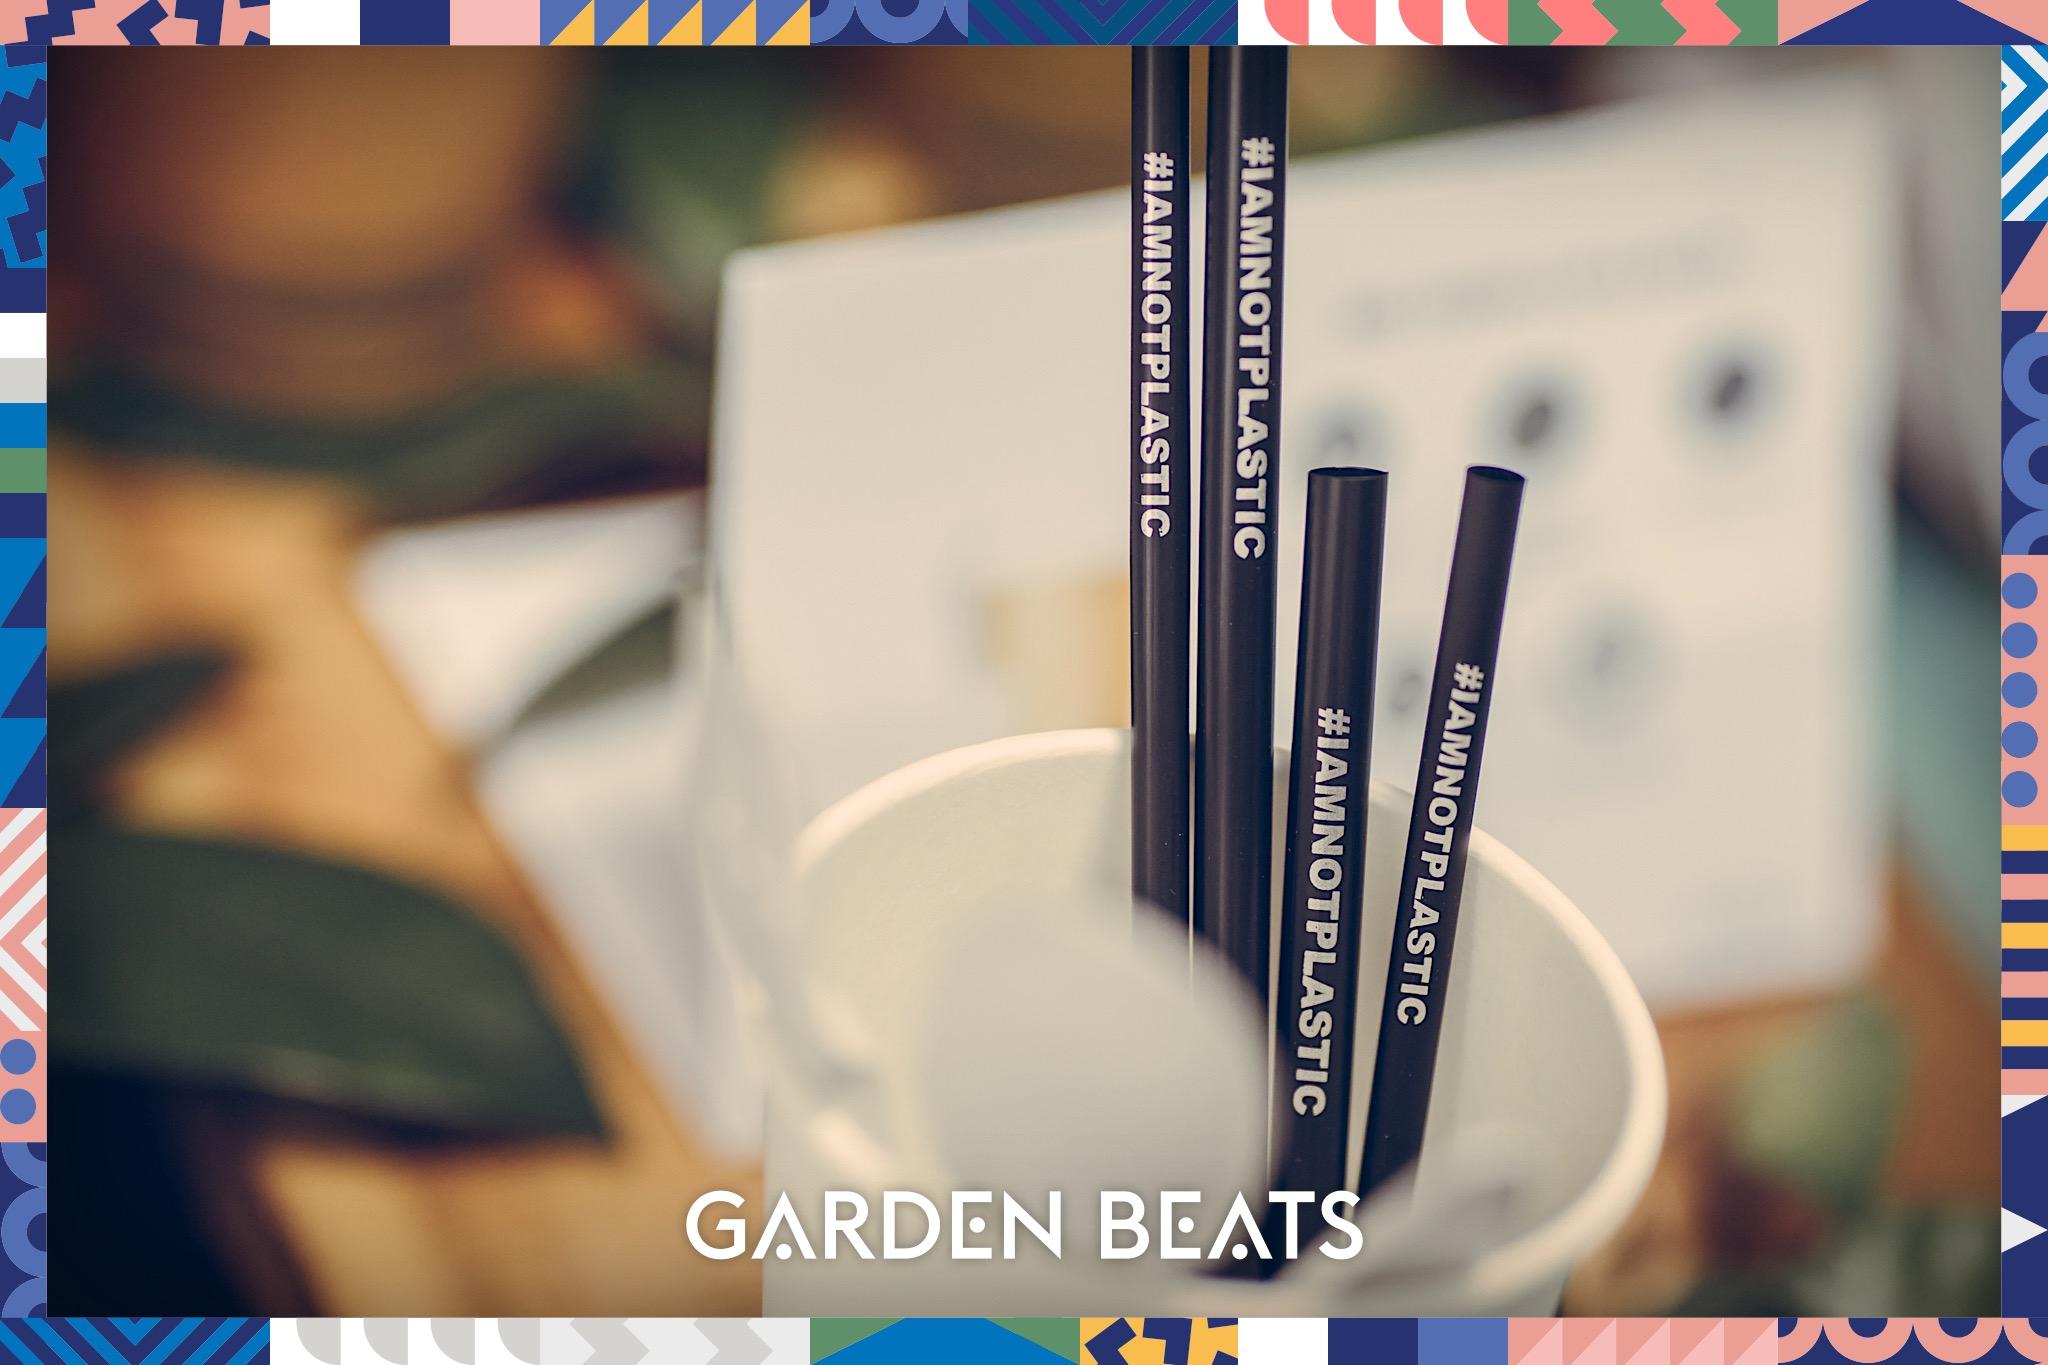 03032018_GardenBeats_Colossal116_Watermarked.jpg